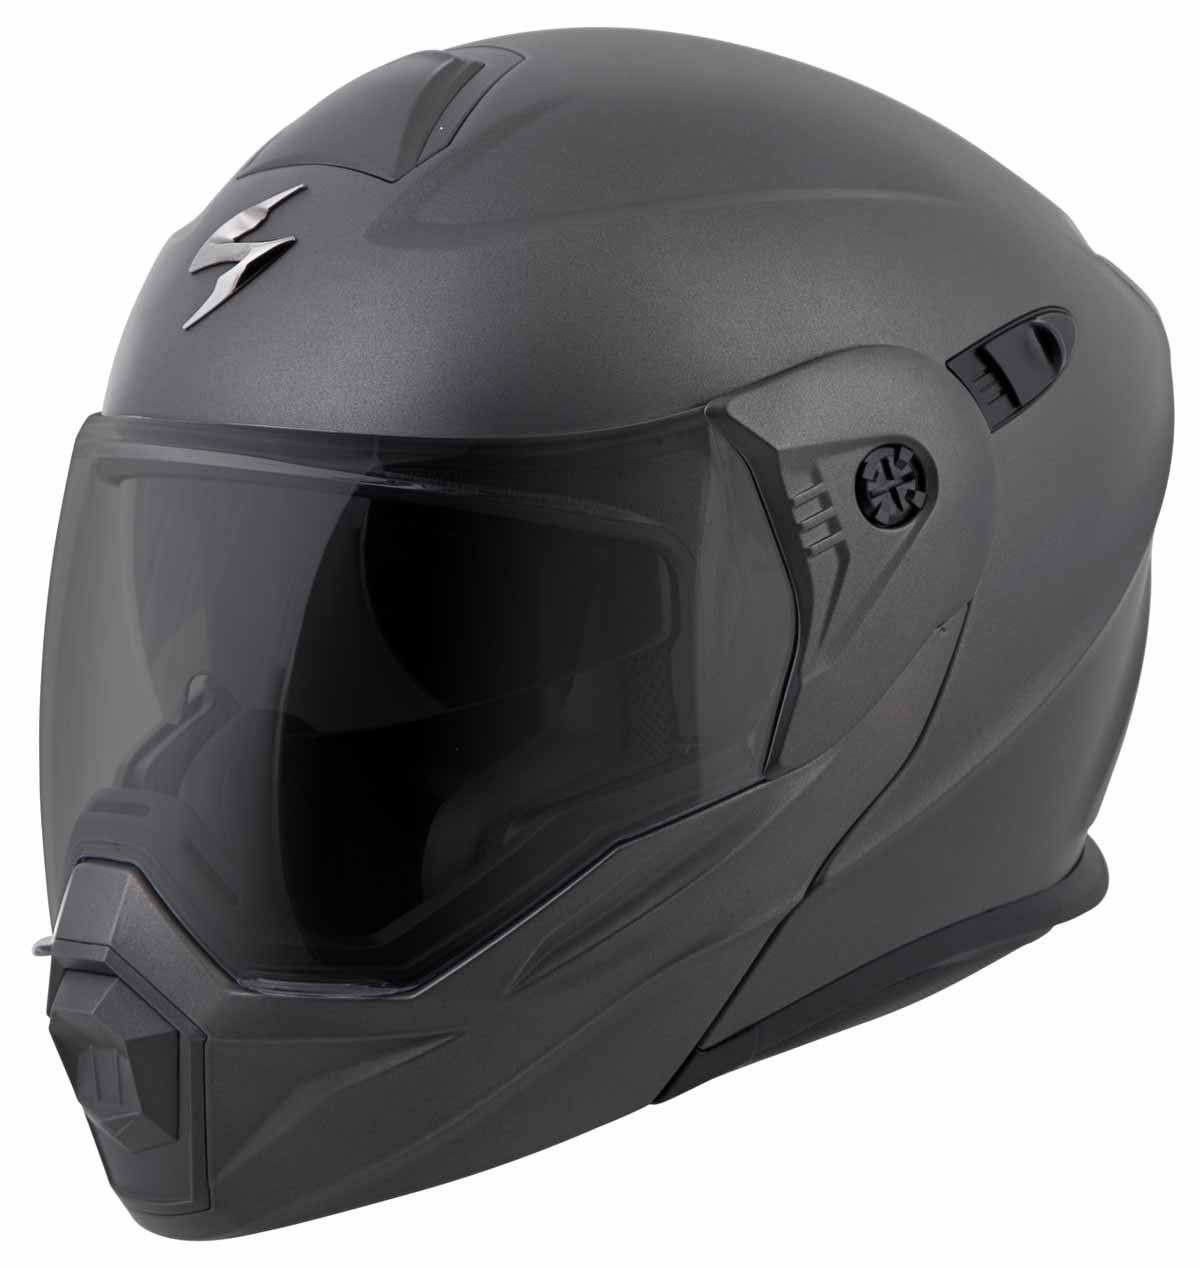 Scorpion-EXO-AT950-Helmet-Flip-Up-Modular-Dual-Sport-Adventure-ADV-DOT-XS-3XL miniature 24